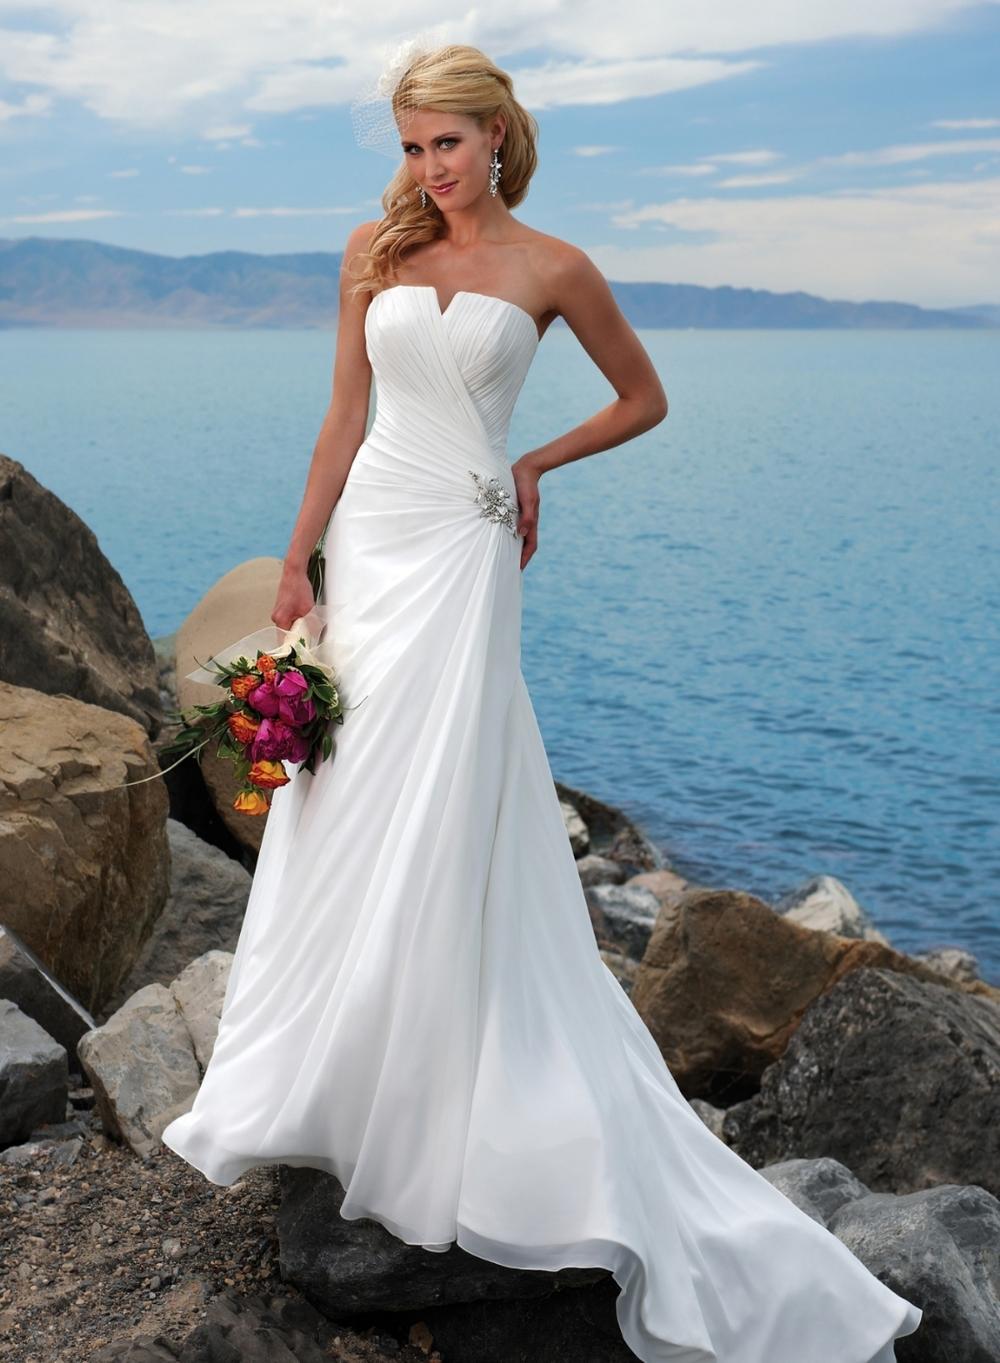 chiffon-strapless-neckline-a-line-wedding-dresses.jpg